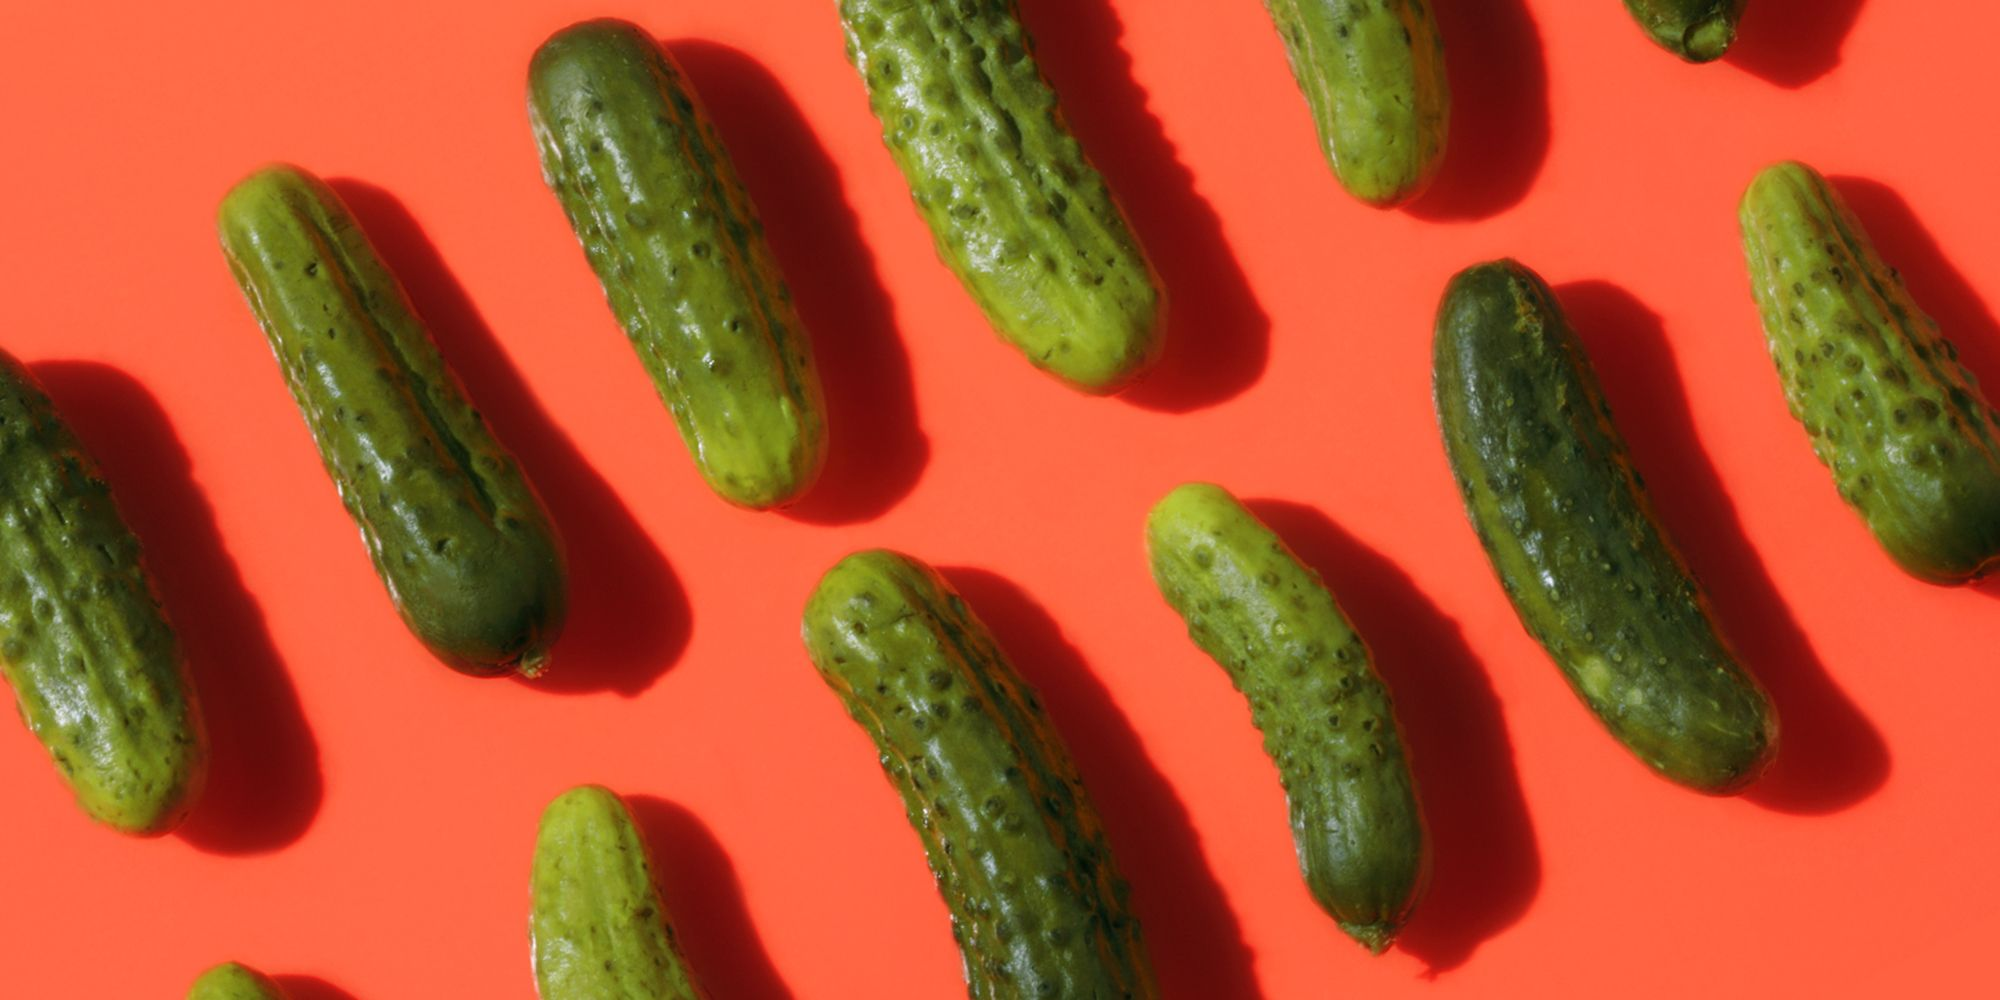 best pickles 2018